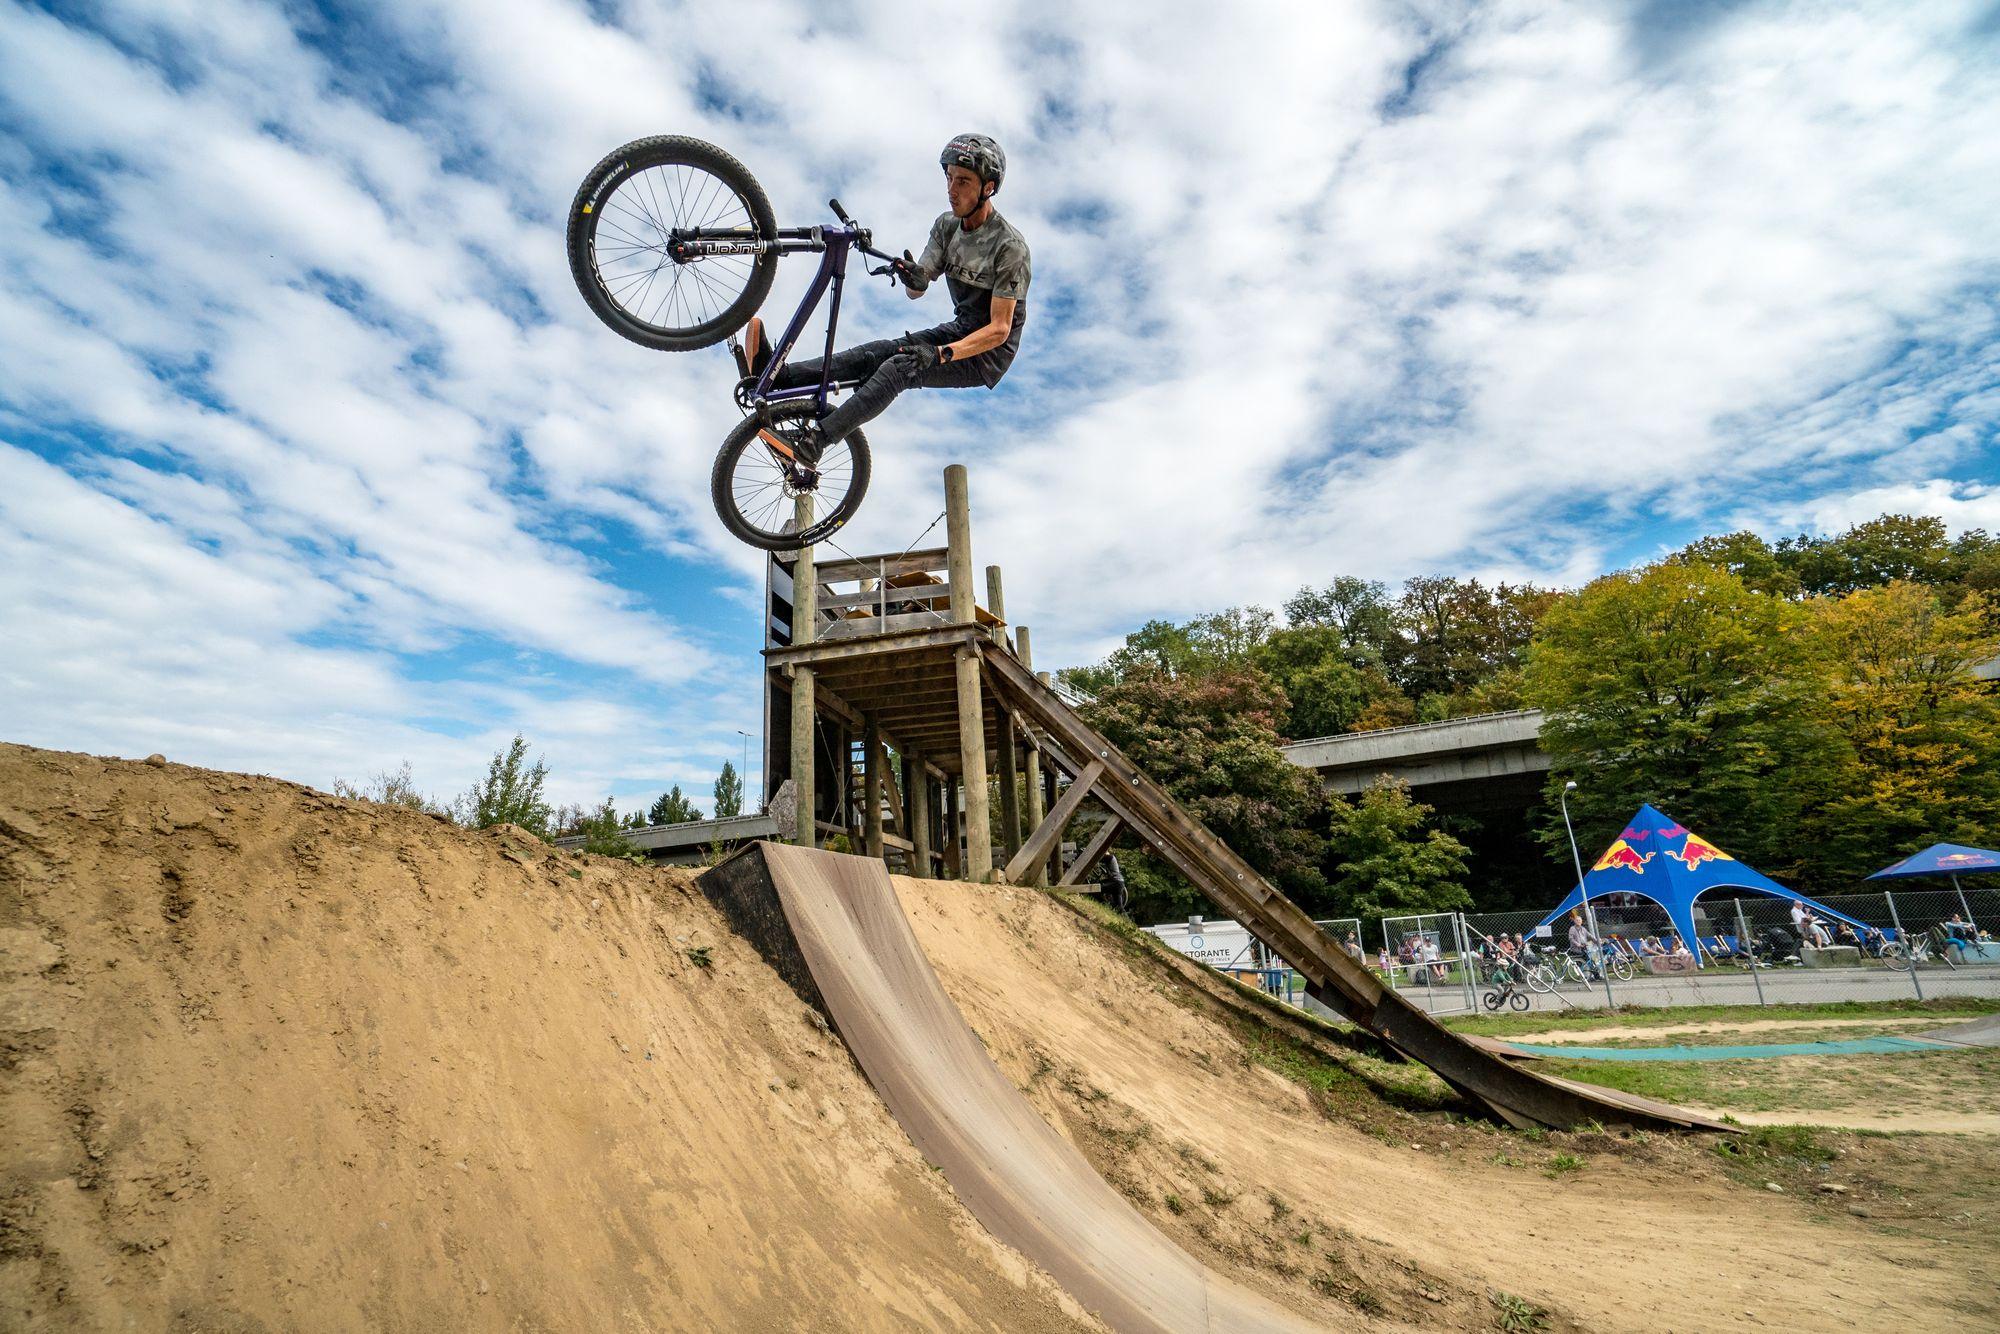 Dirt Contest im   Züritrails Jumppark